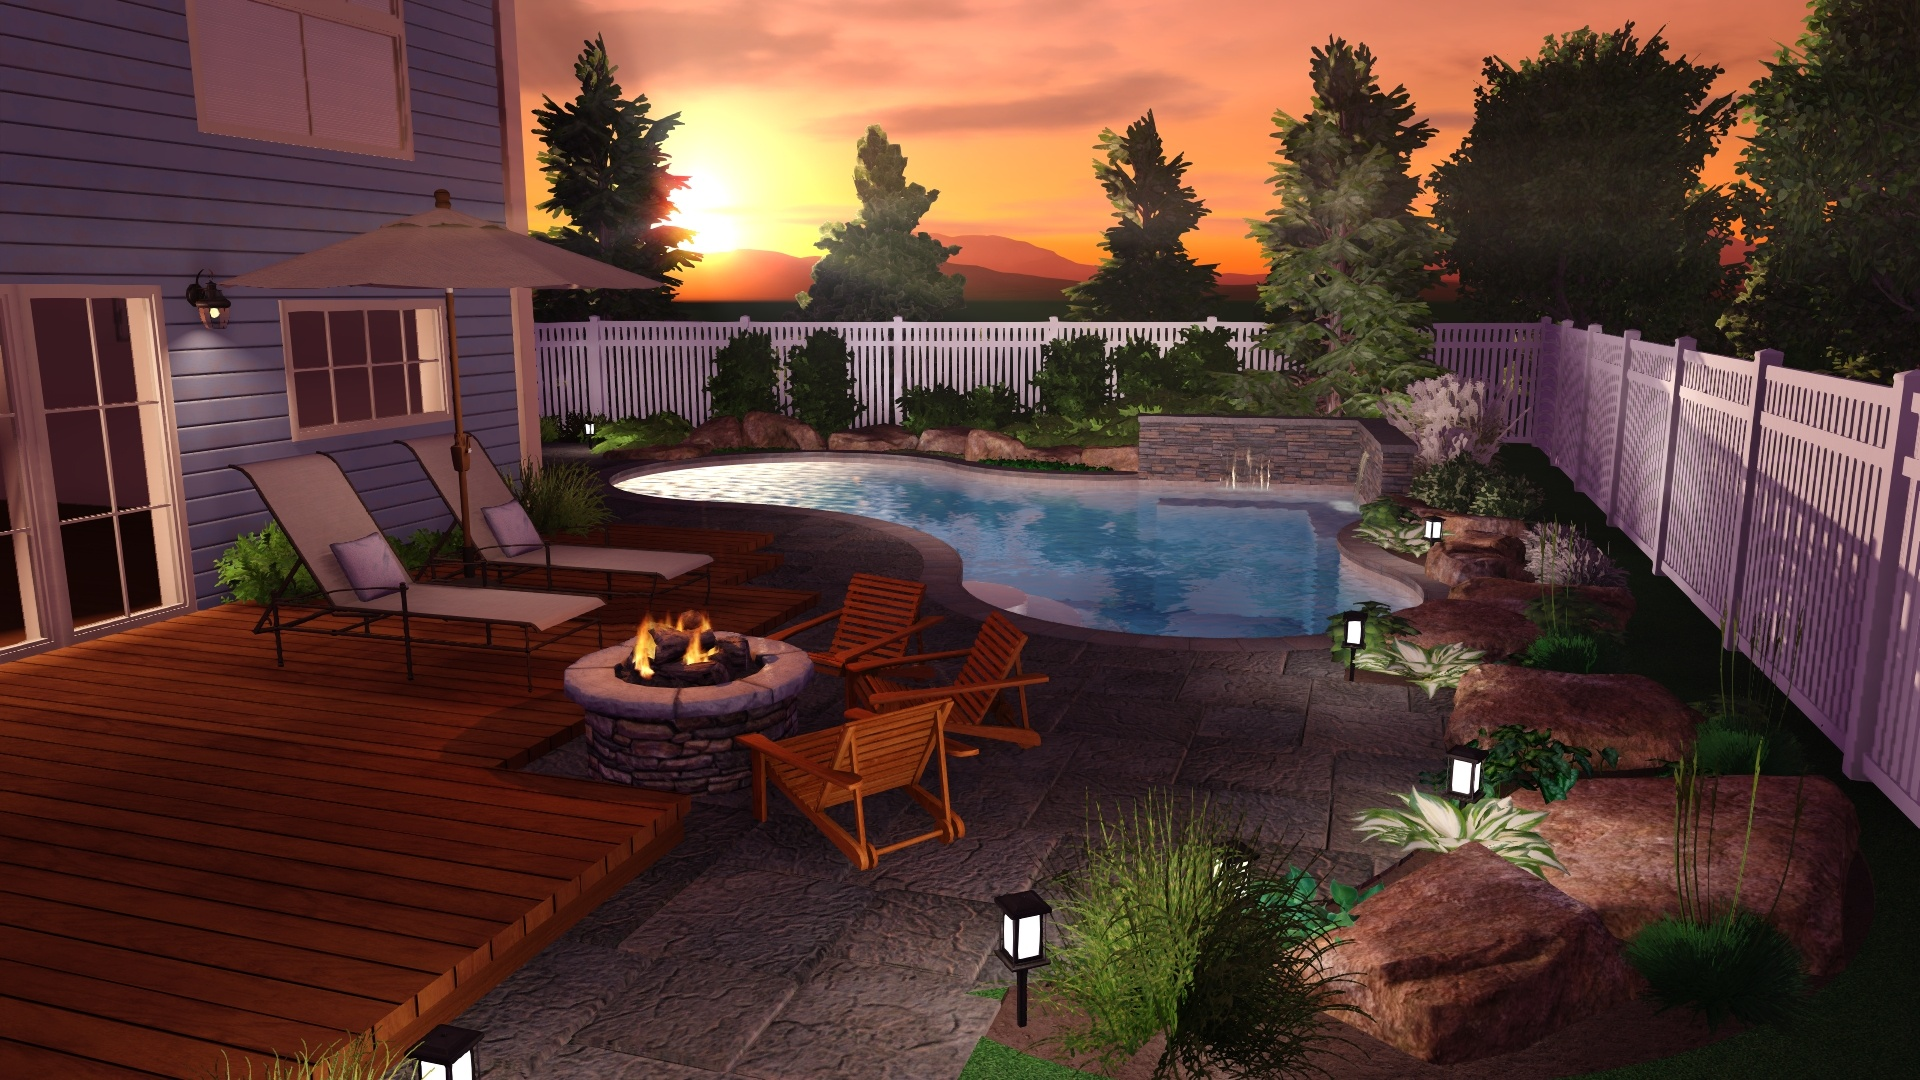 Download 20 Free Swimming Pool Templates